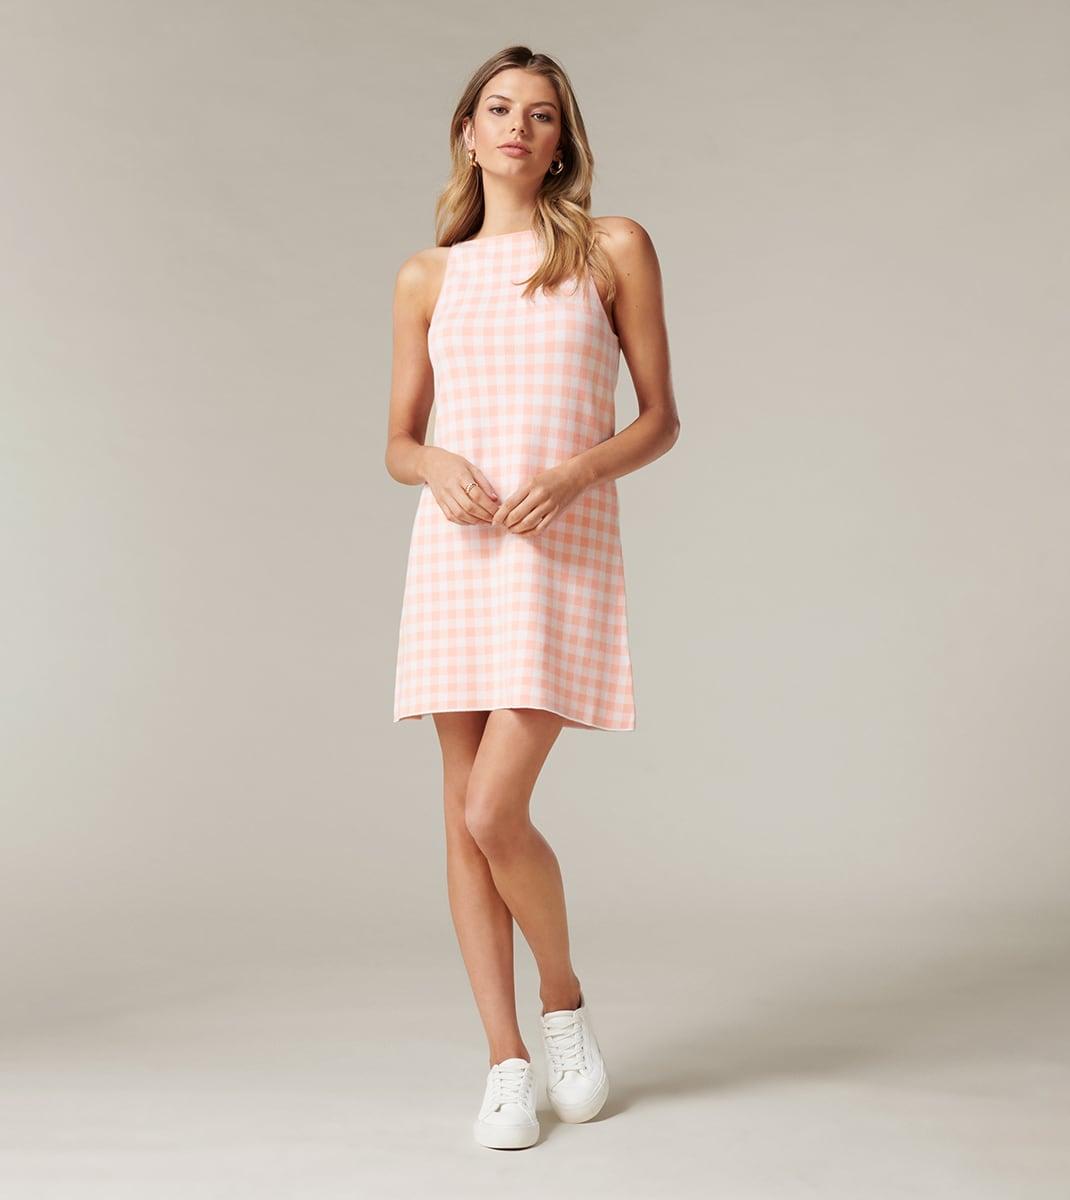 Fun and Feminine Dresses